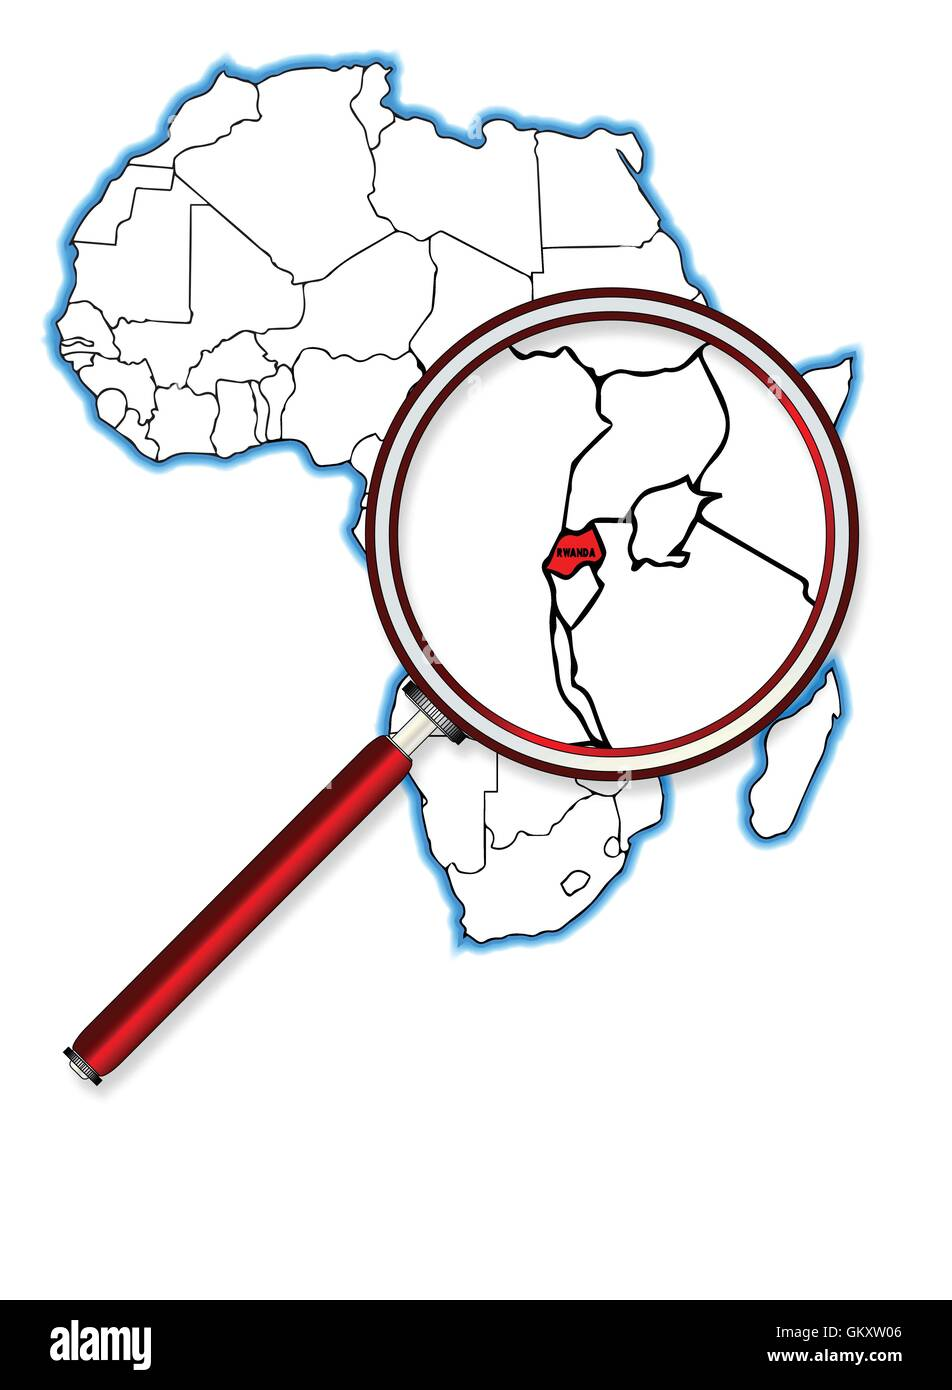 Rwanda Under A Magnifying Glass - Stock Image